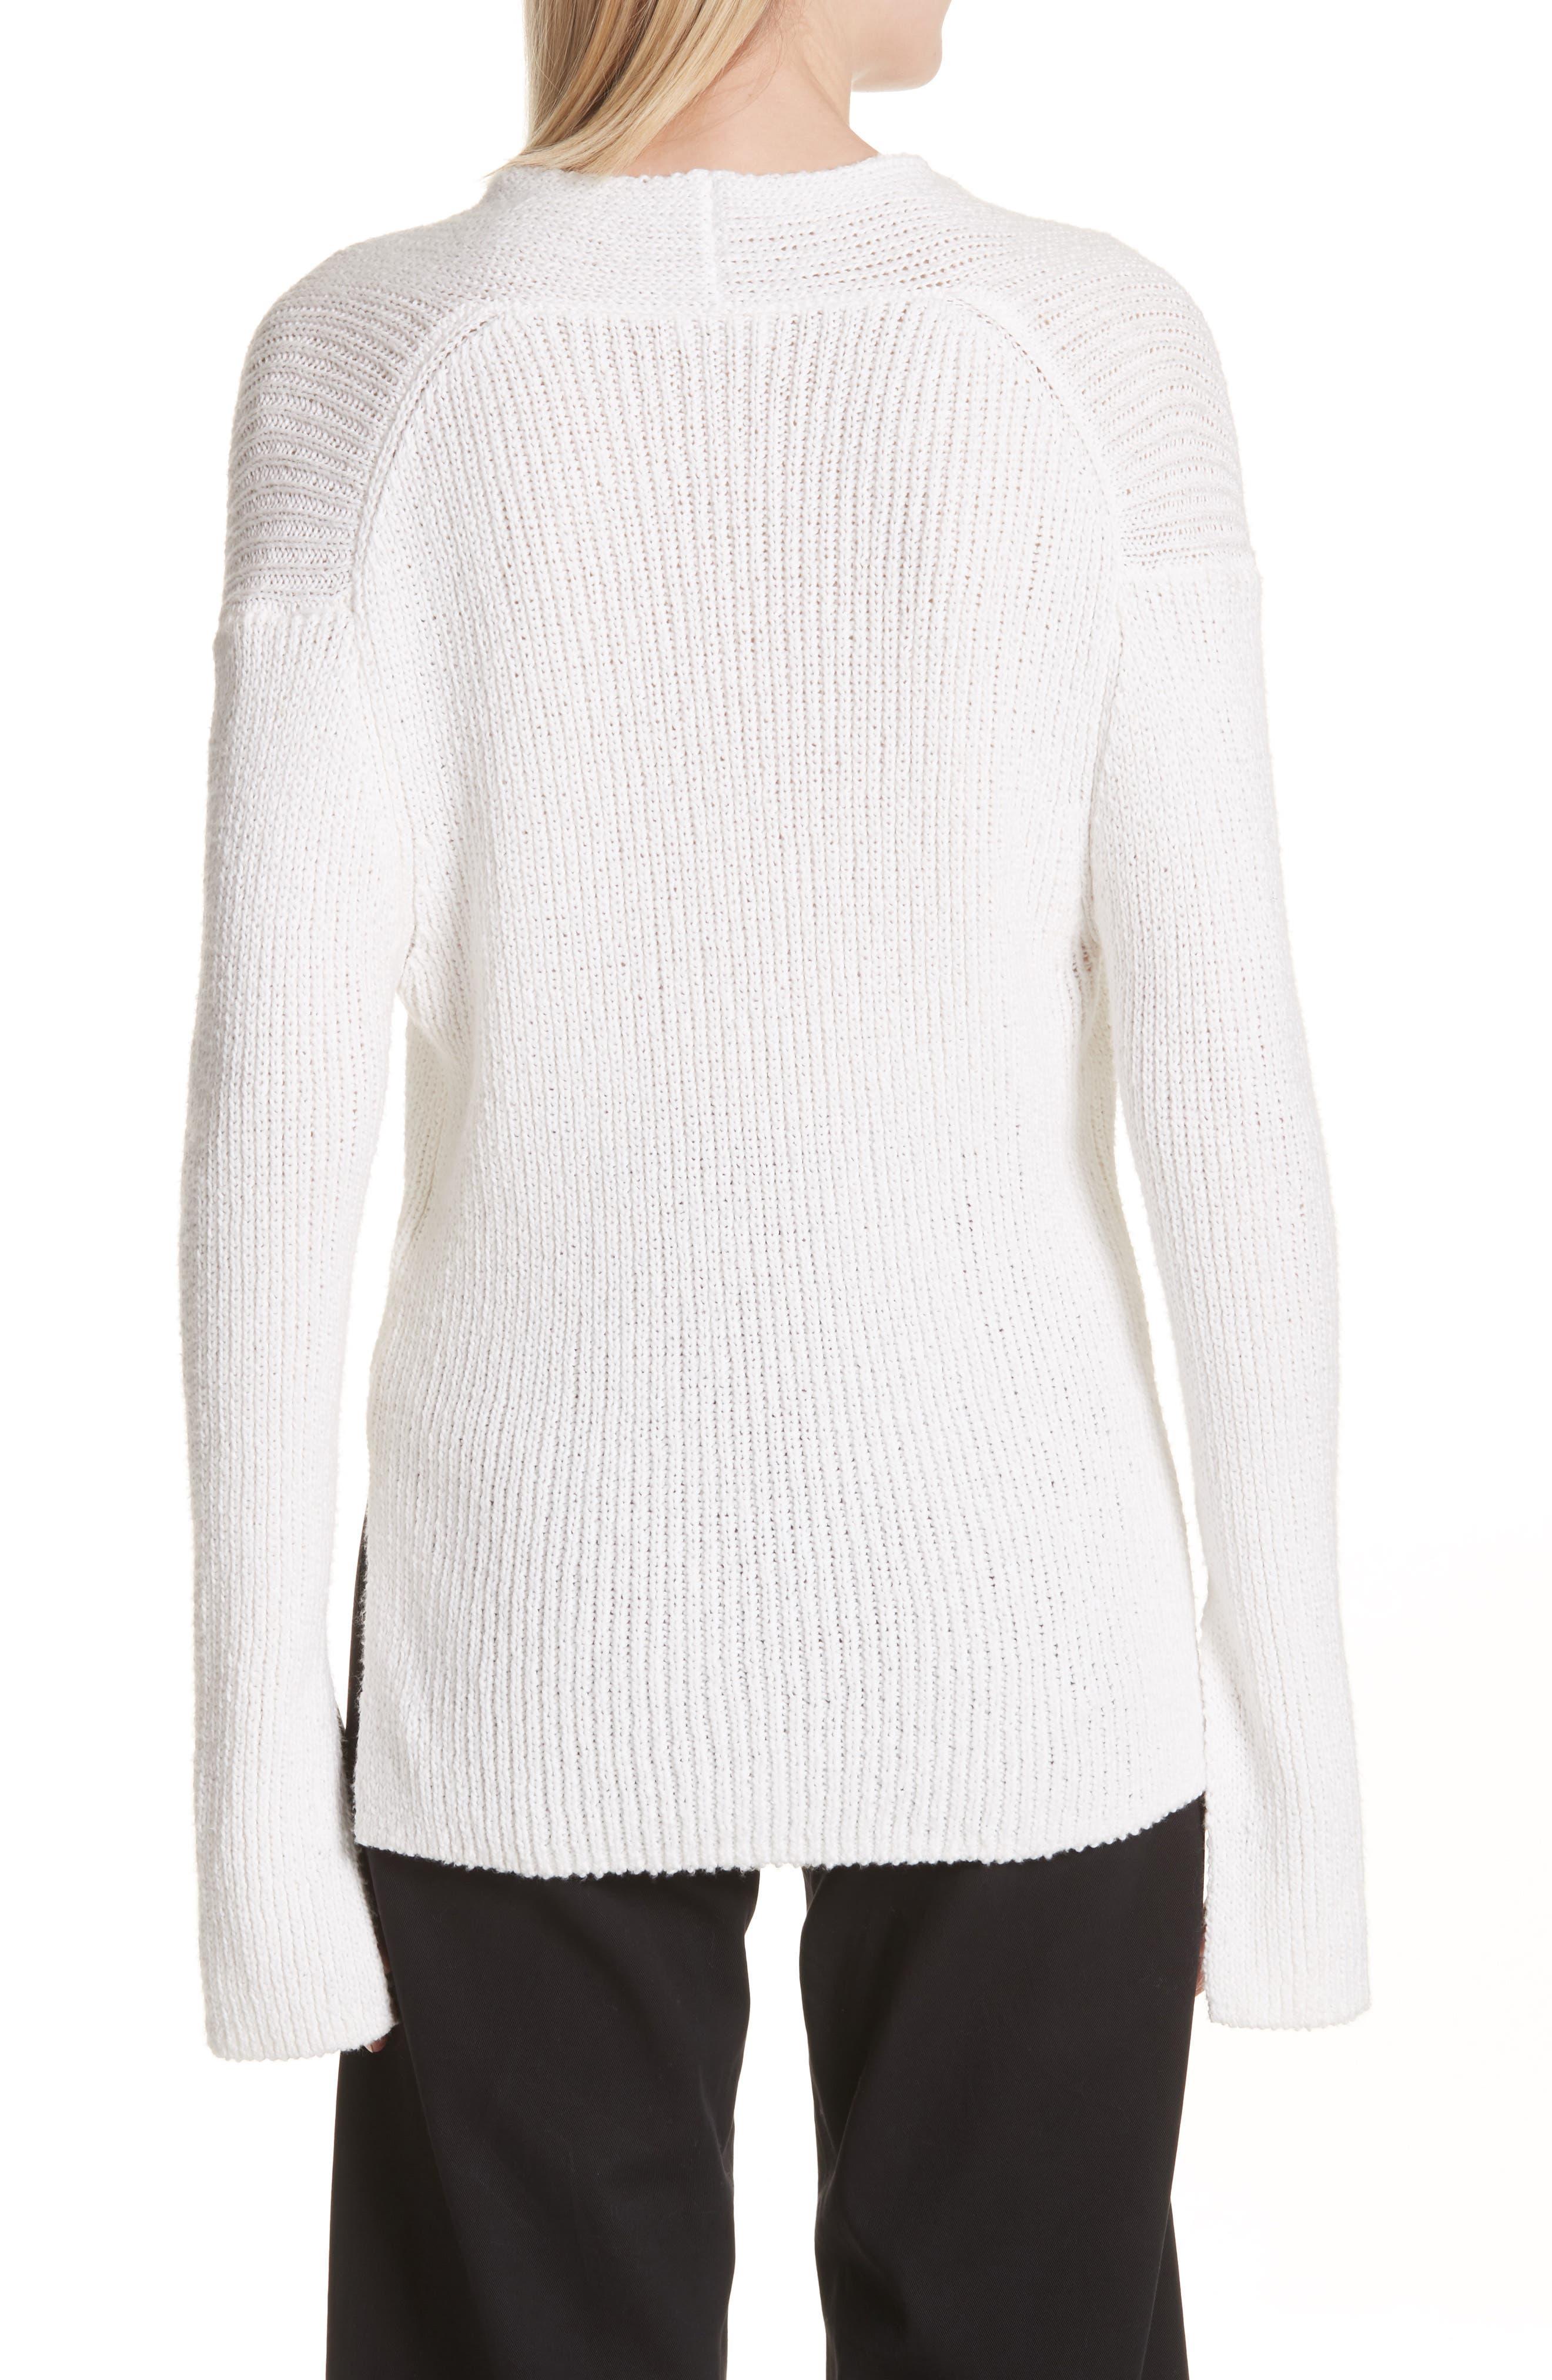 Nick Cotton Sweater,                             Alternate thumbnail 2, color,                             White